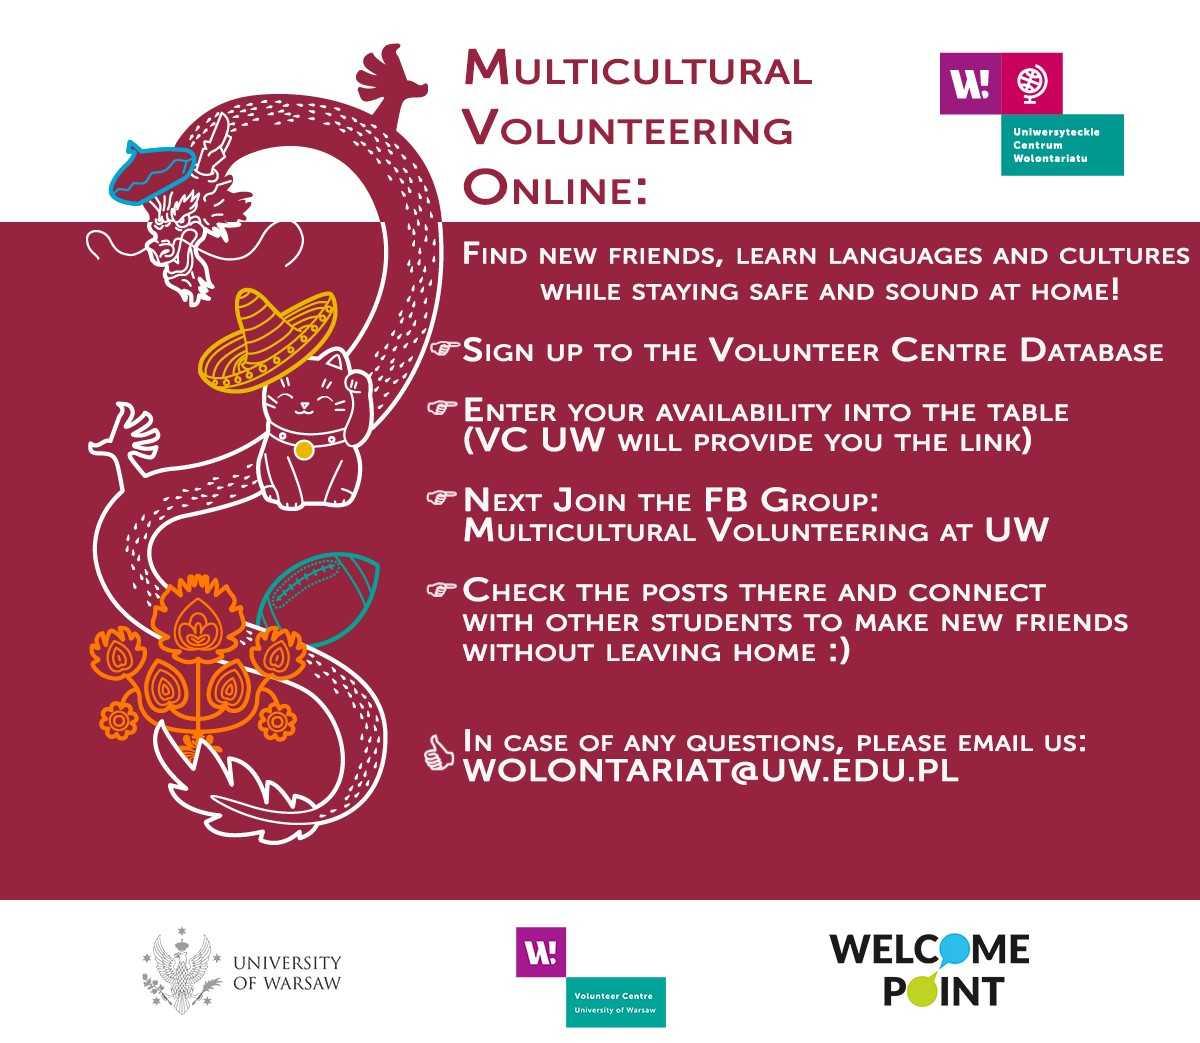 Multicultural Volunteering Online